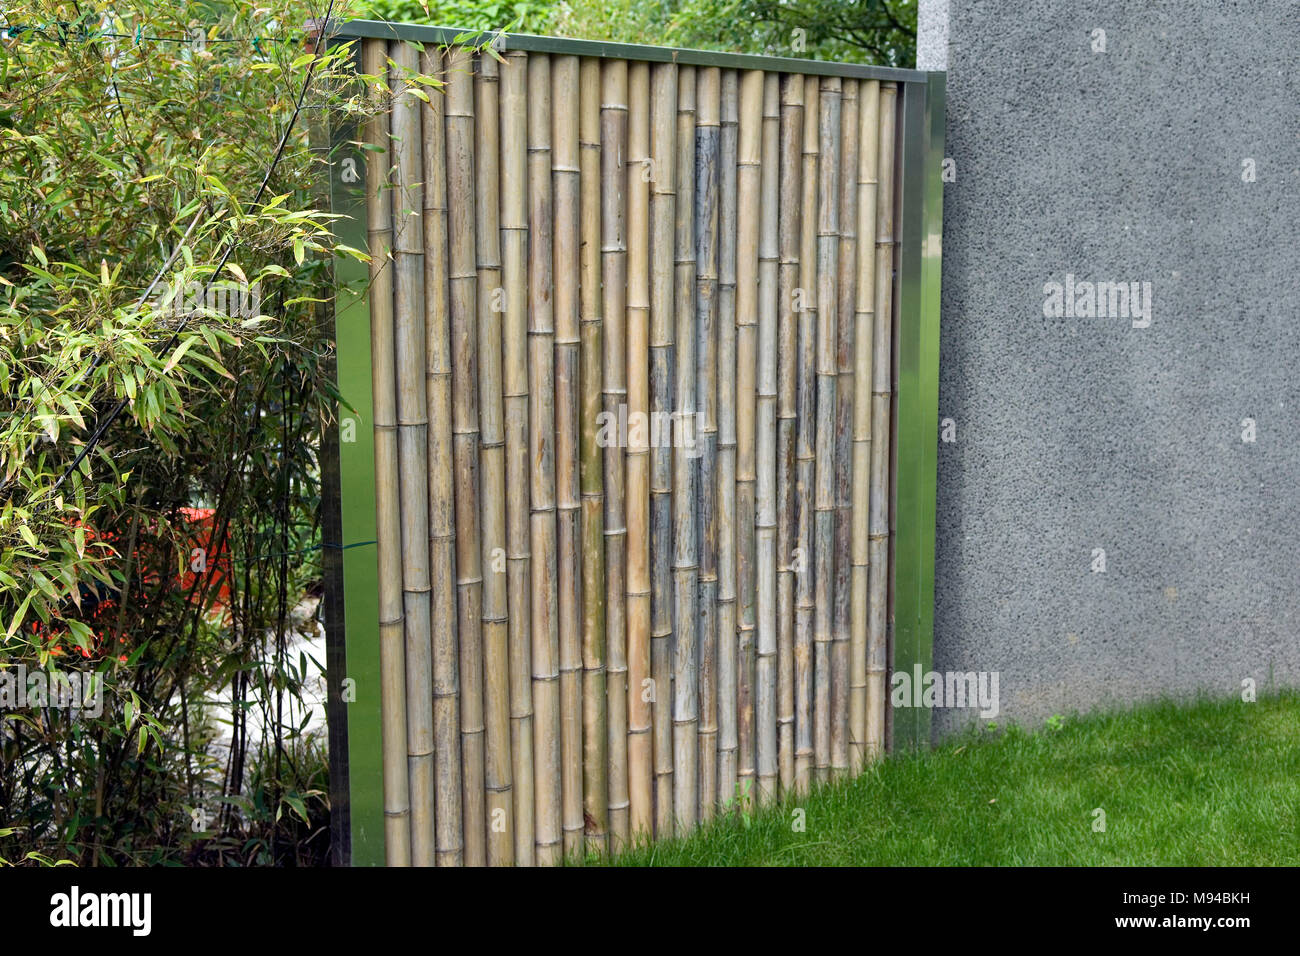 Bambus Sichtschutz Bambusschutzwand Stock Photo Alamy